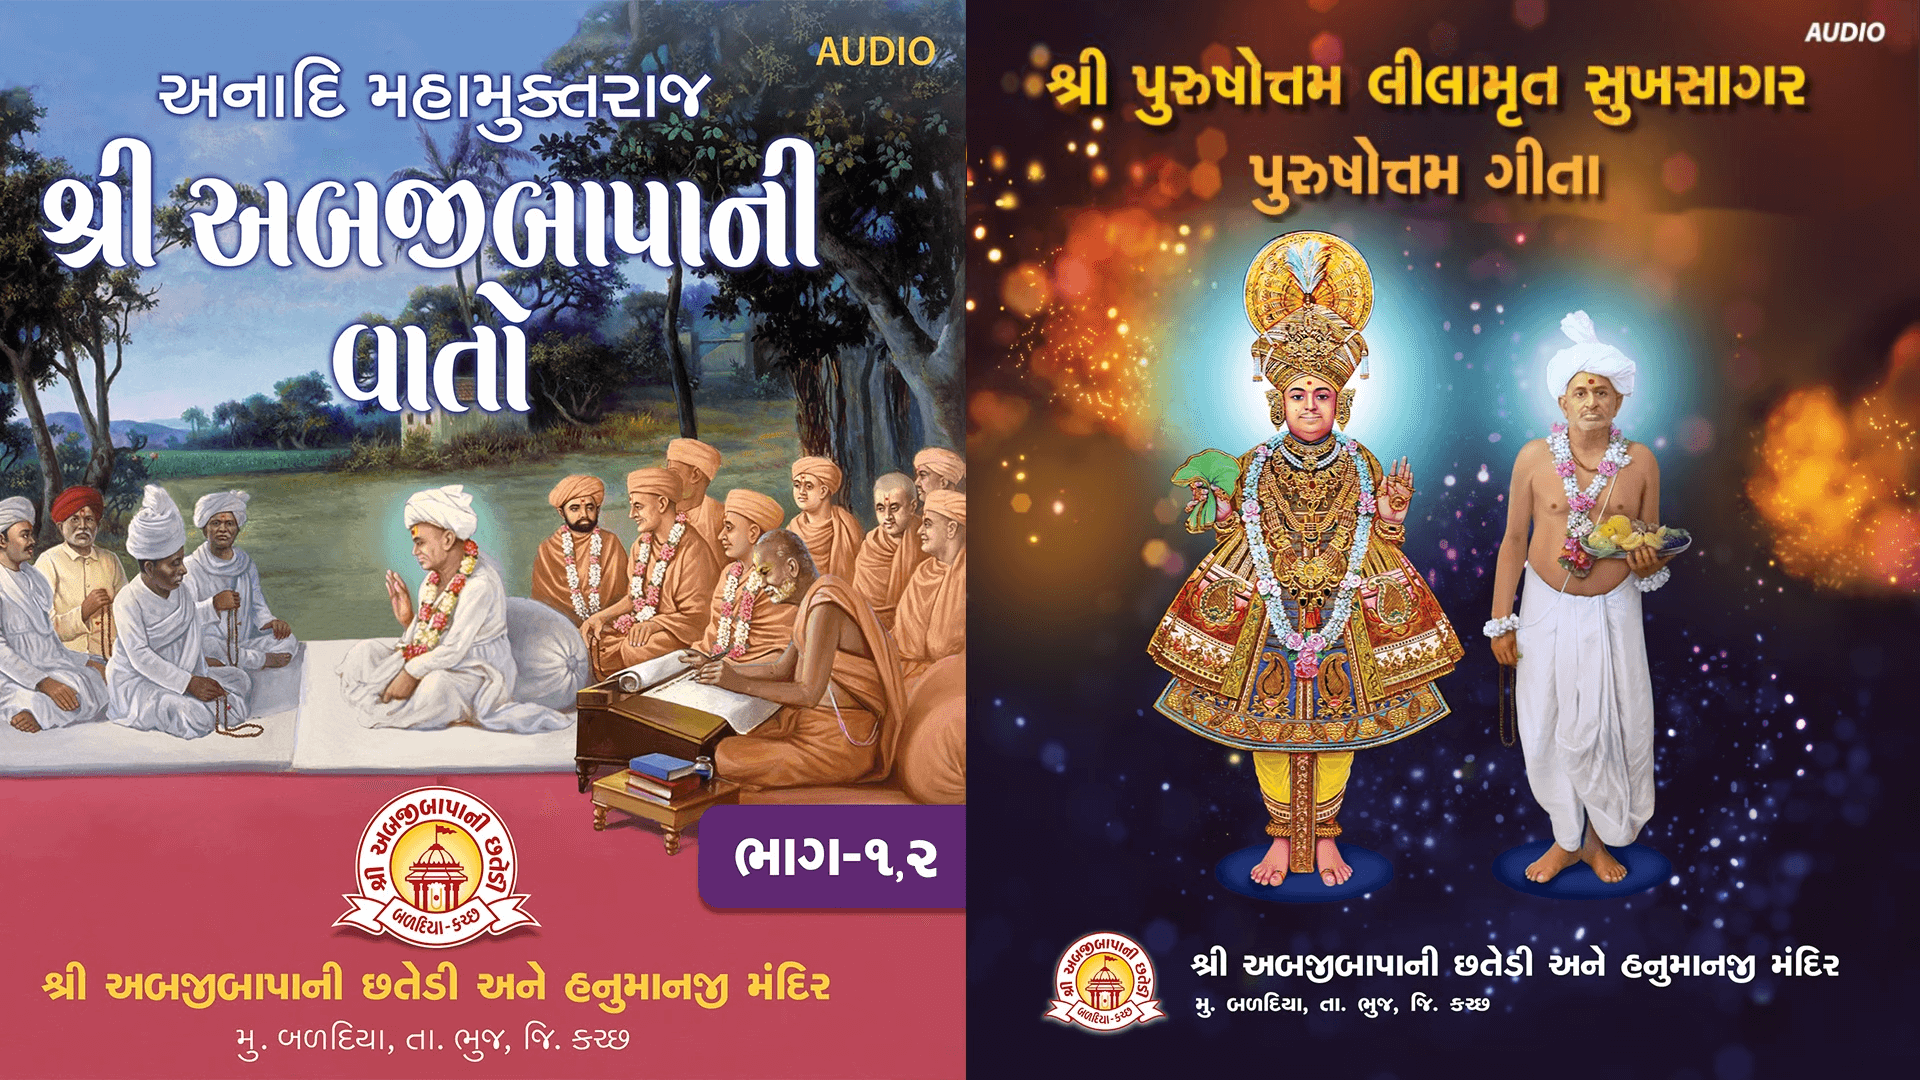 Abjibapani Vato Bhag 1,2 and Purshottam Lilamrut Sukhsagar Audio